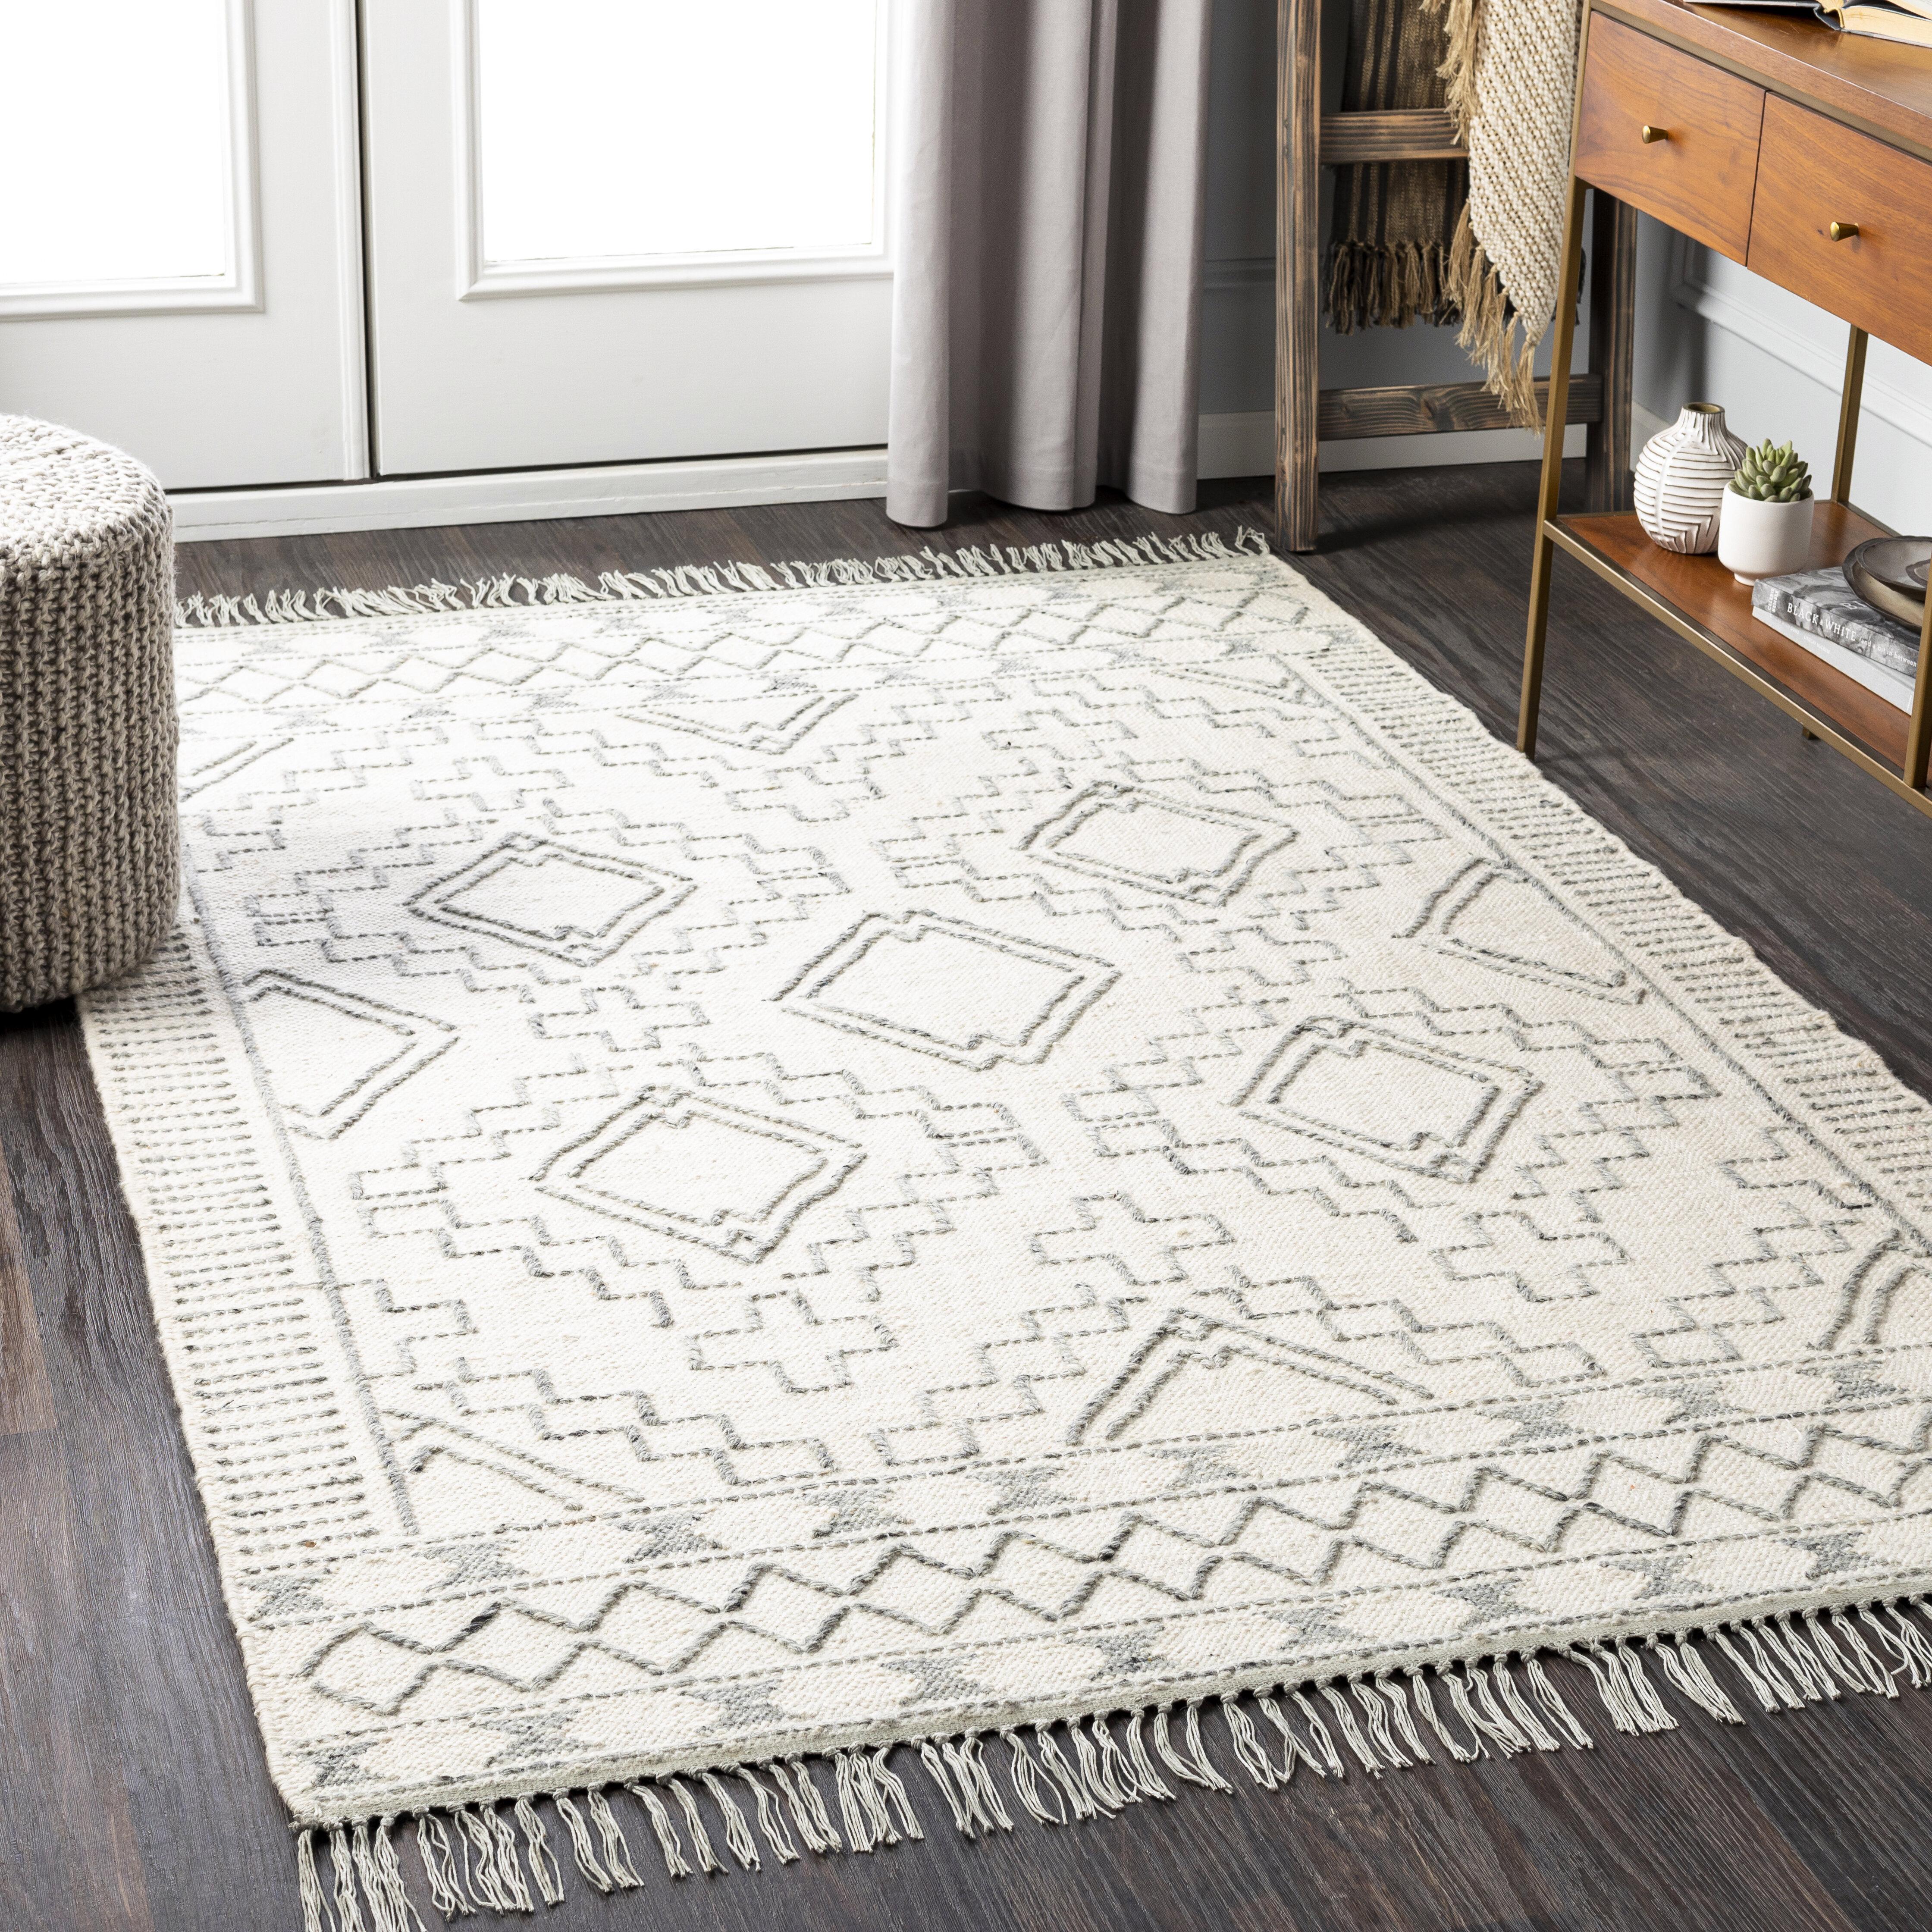 Allmodern Cypres Geometric Hand Tufted Wool Cream Gray Area Rug Reviews Wayfair